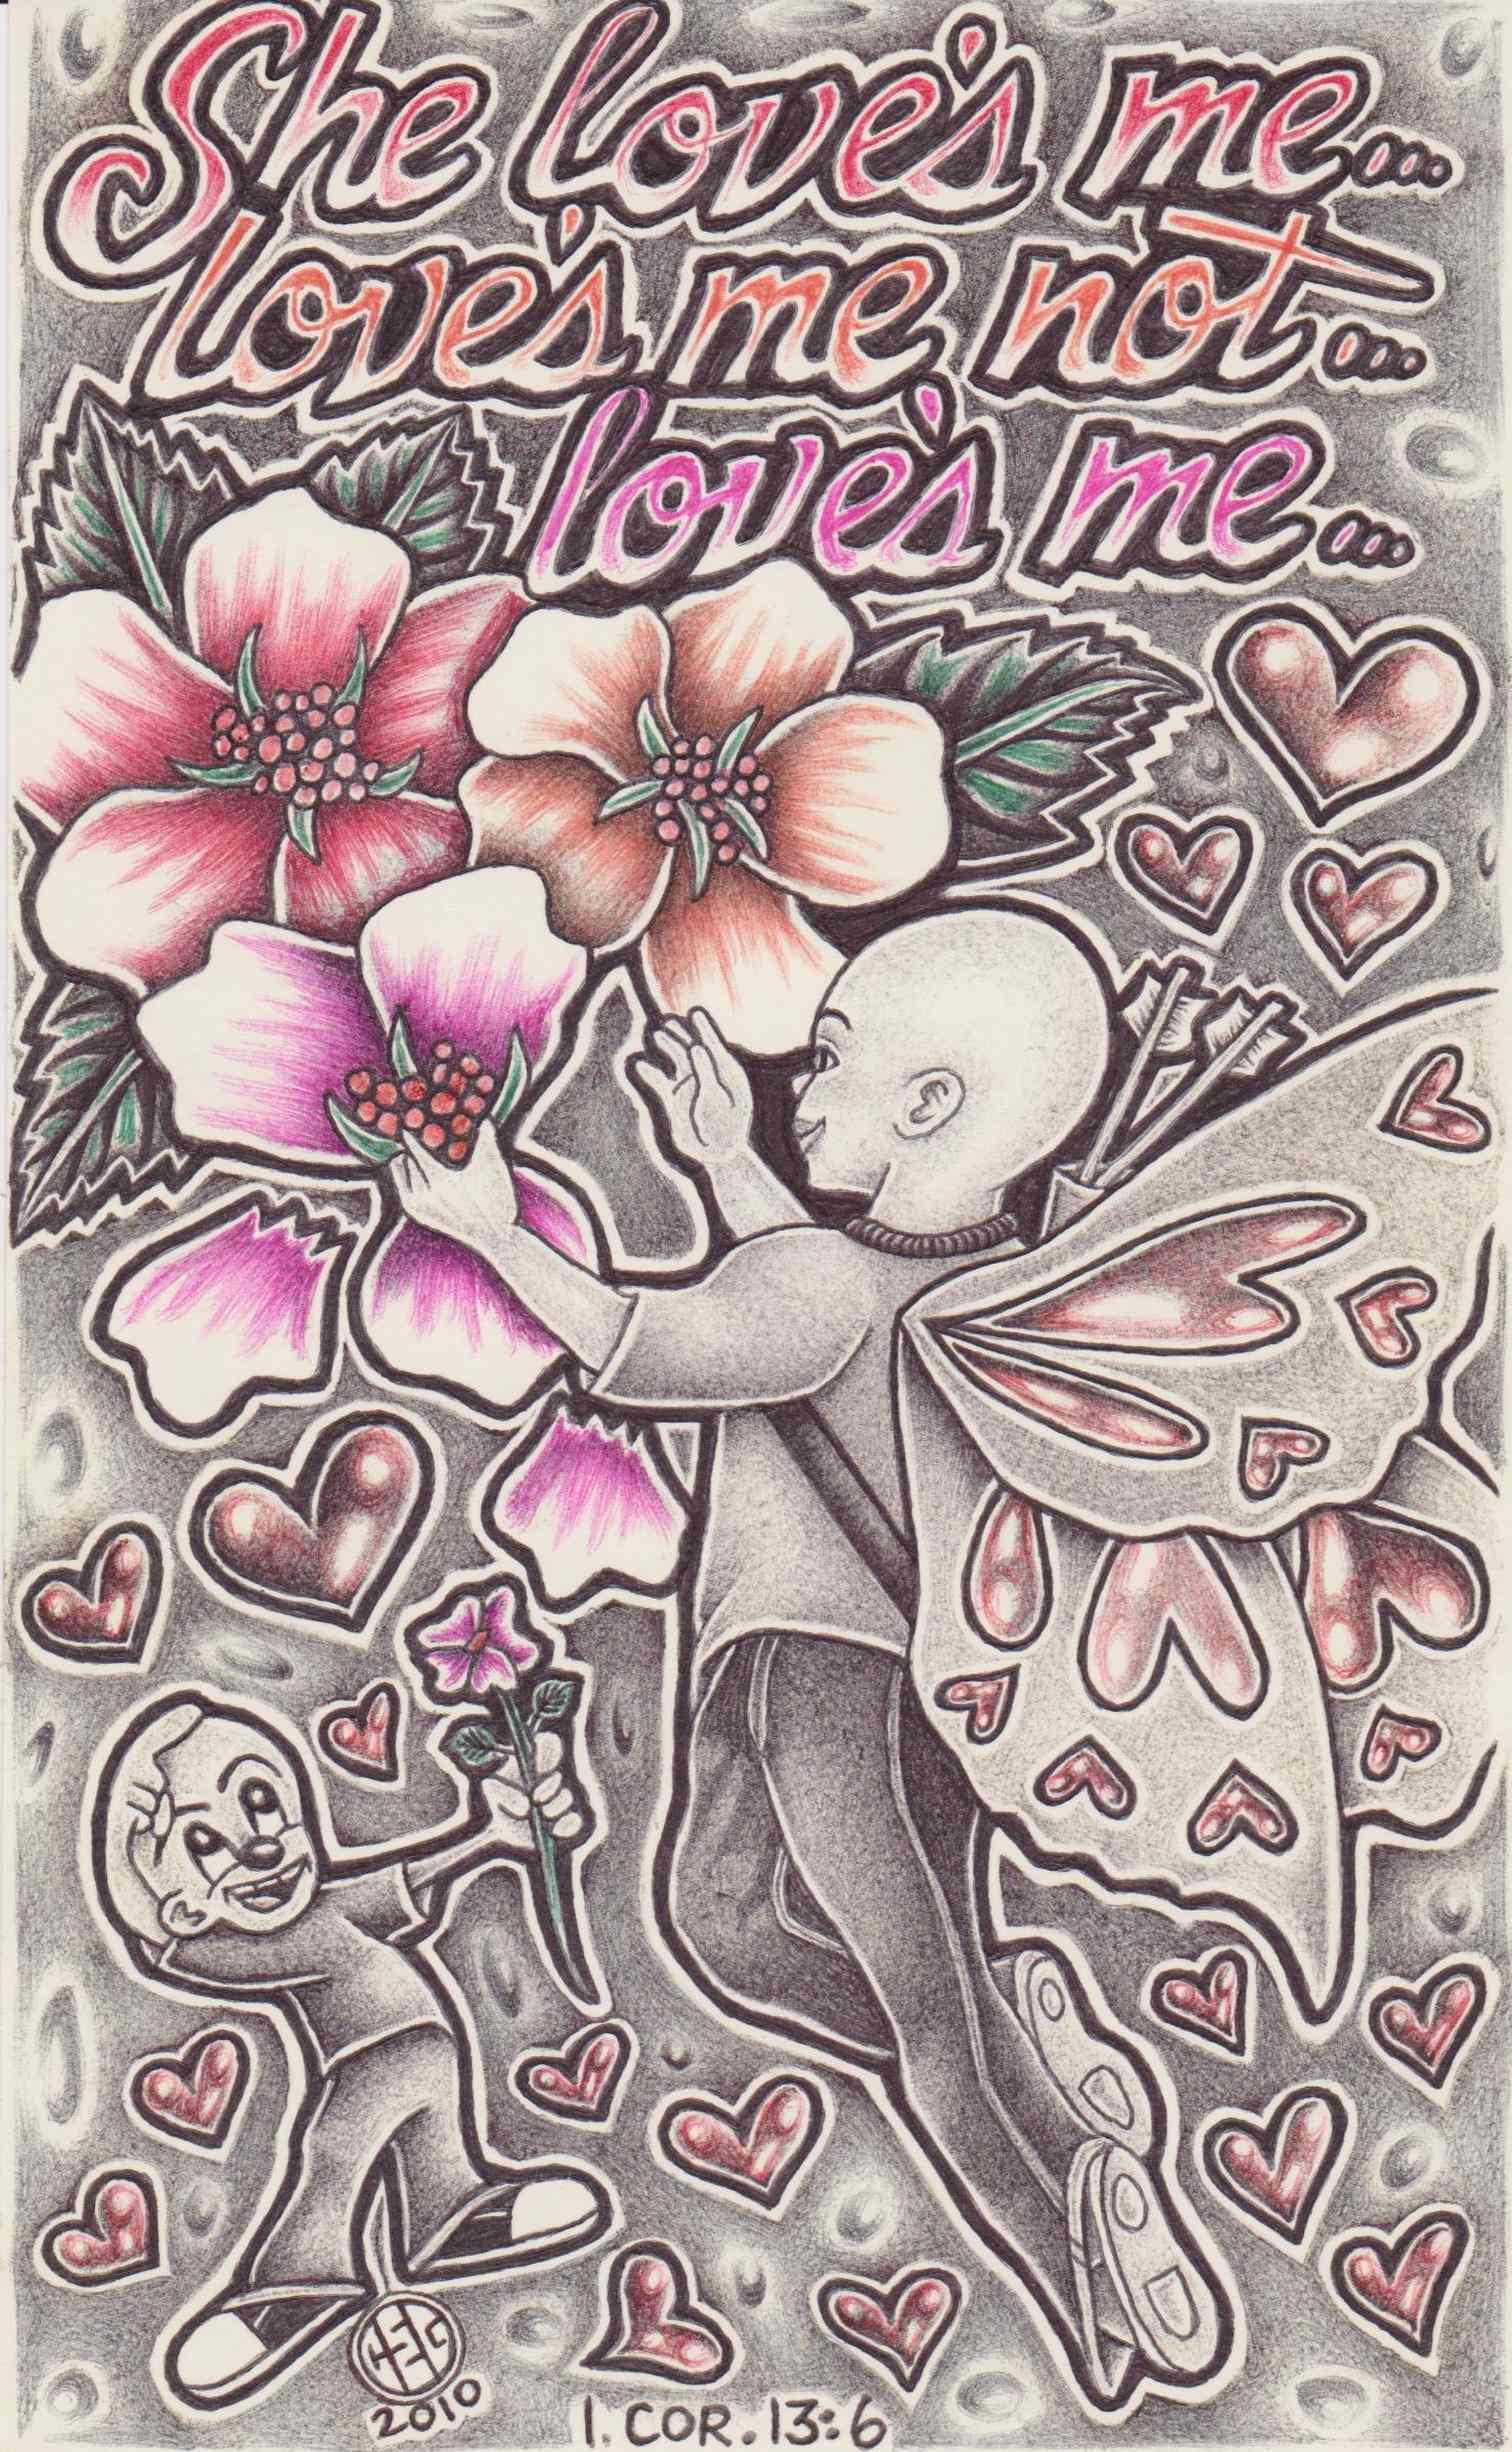 She loves me, loves me not...by Carlos E. Galindo.jpg